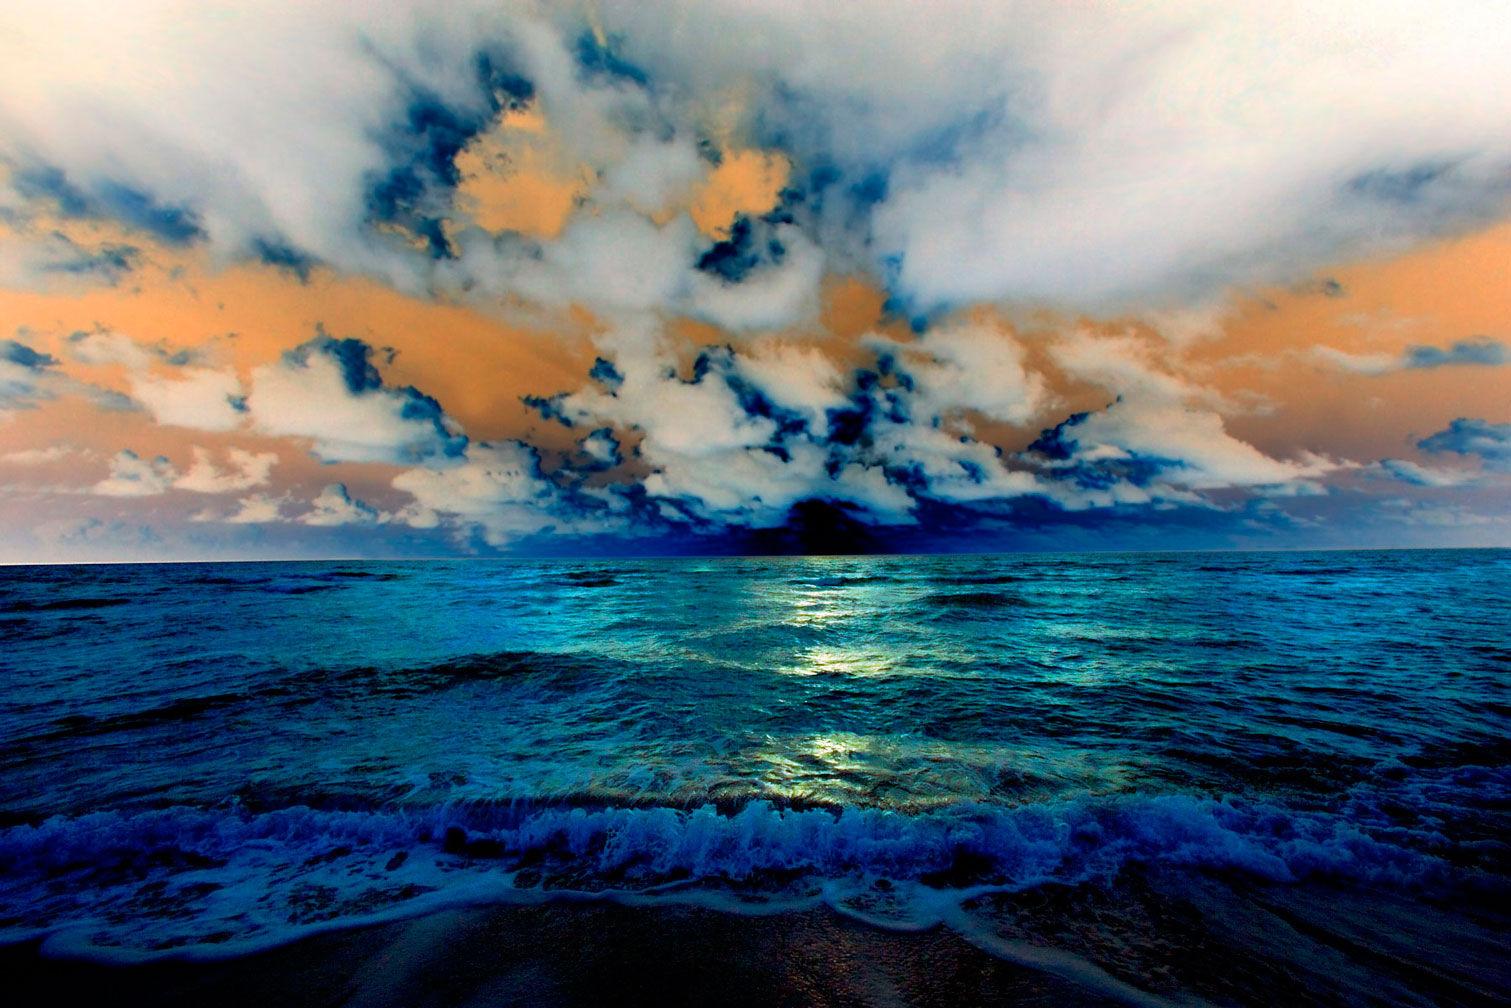 AQUA BLUTOPIA : Inspirational World Renowned Photographer ...